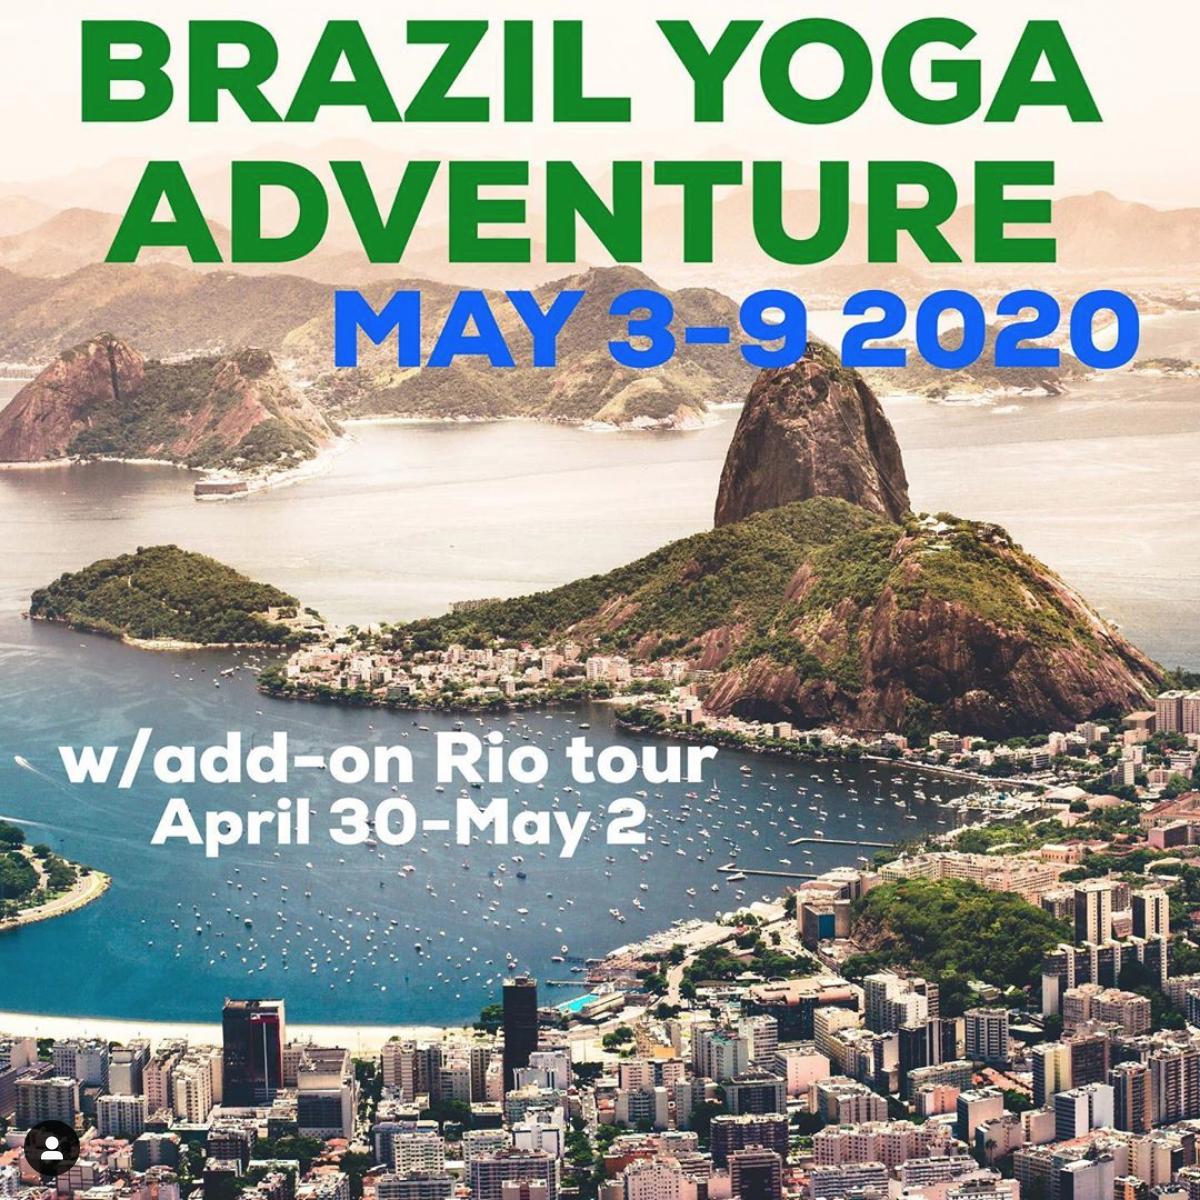 http://www.yogawithalice.com/wp-content/uploads/2019/11/BrazilYogaAdventureWithAliceKennedy.png